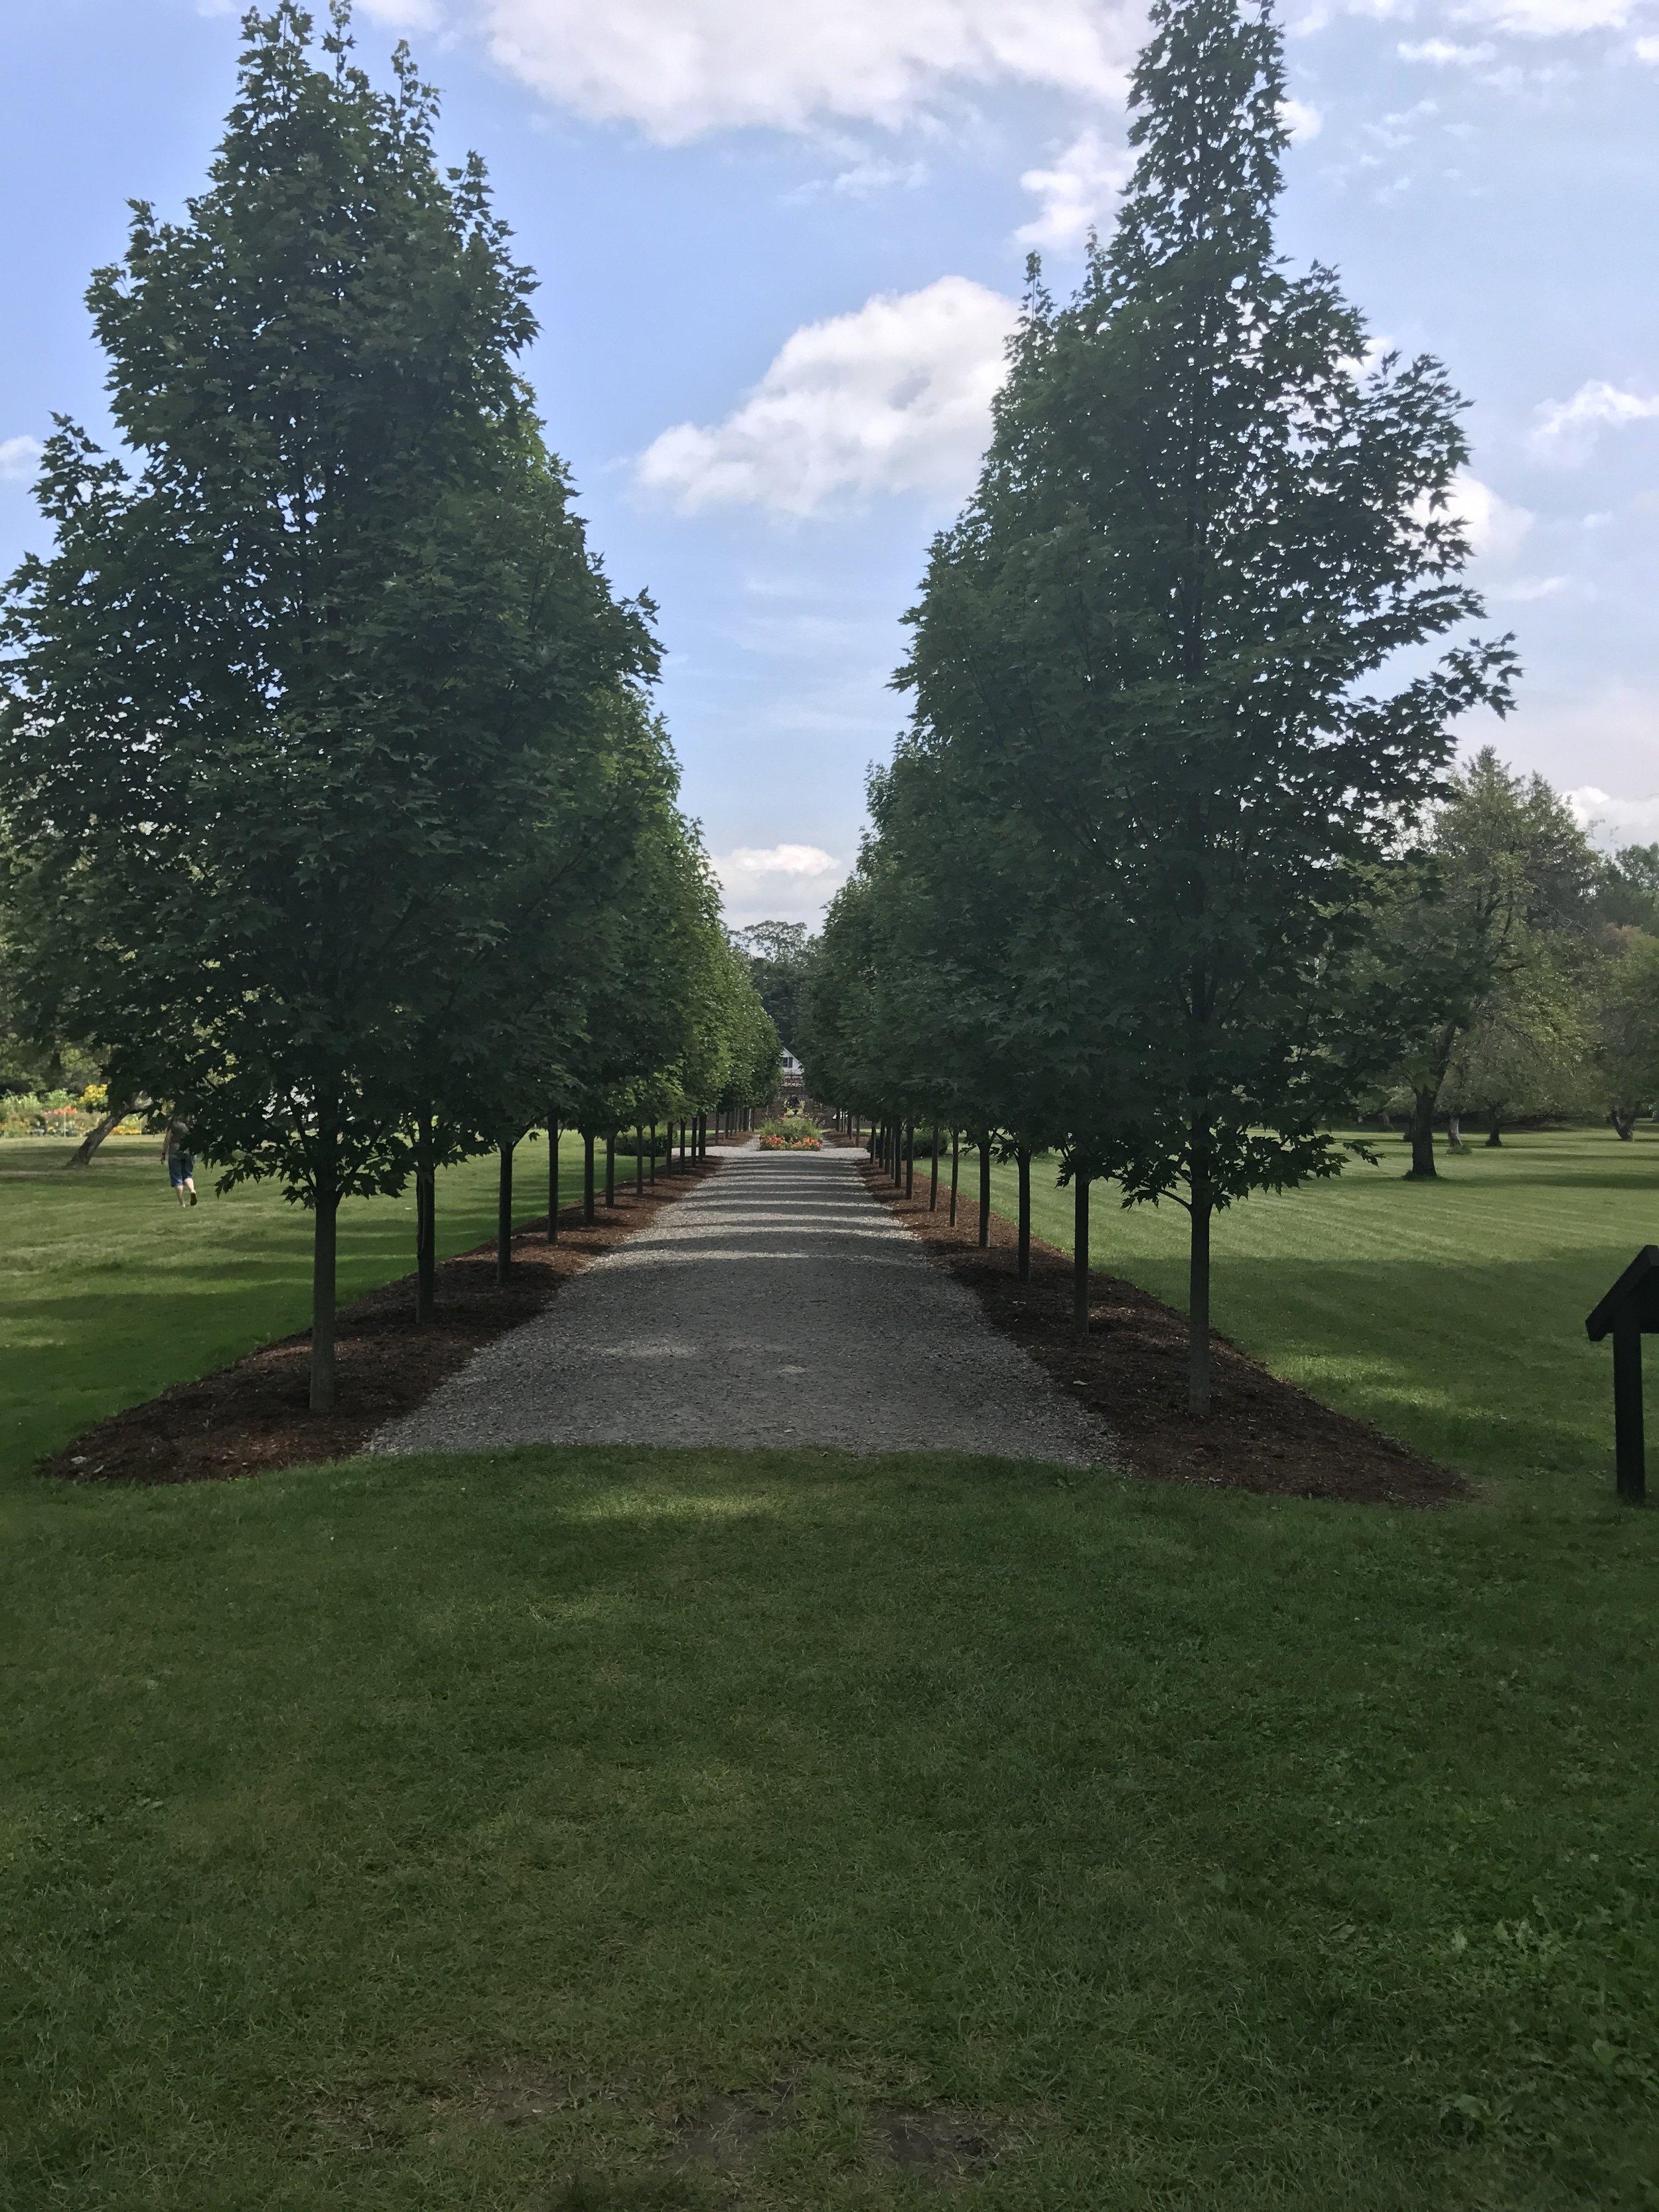 Gardens at Fort Ticonderoga